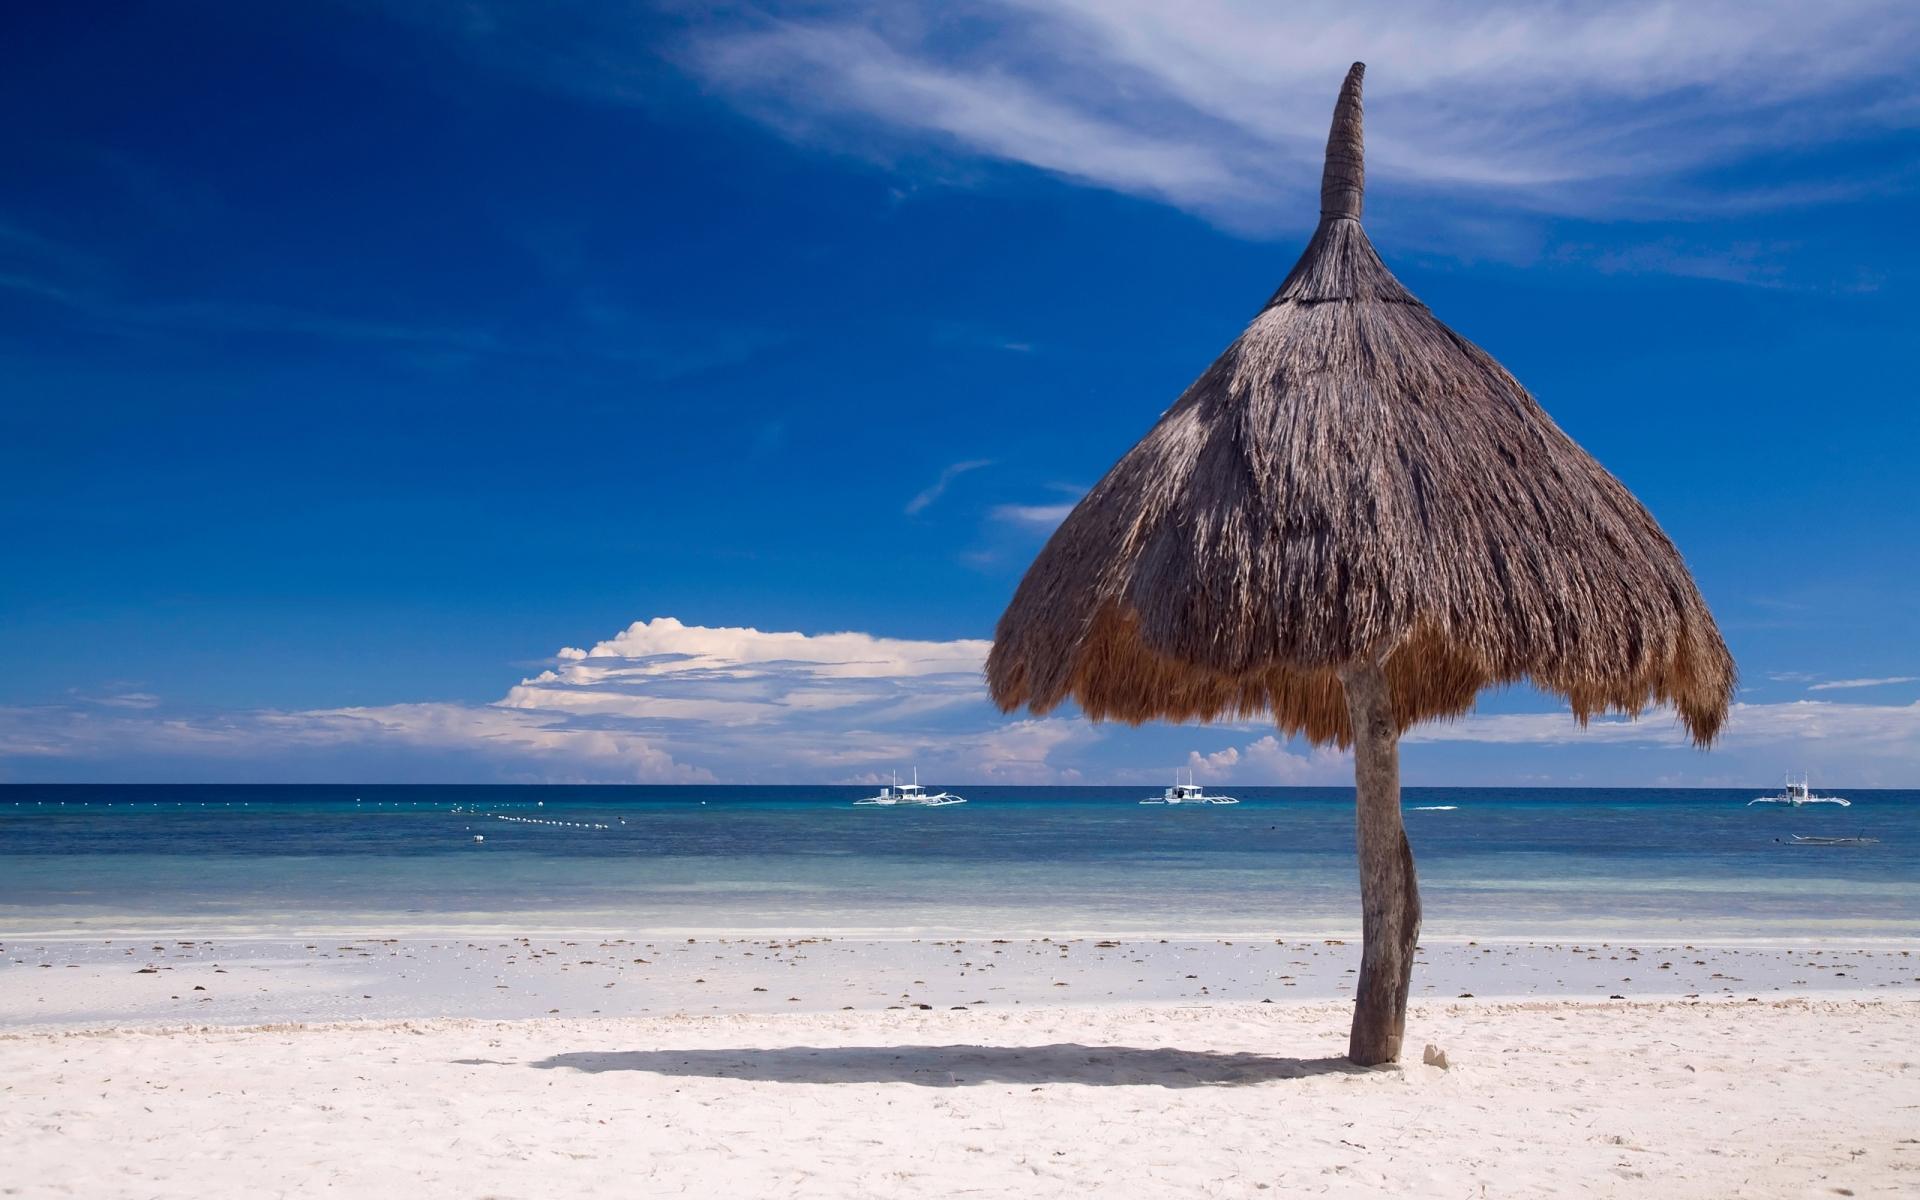 Playa de Punta Sal - 1920x1200